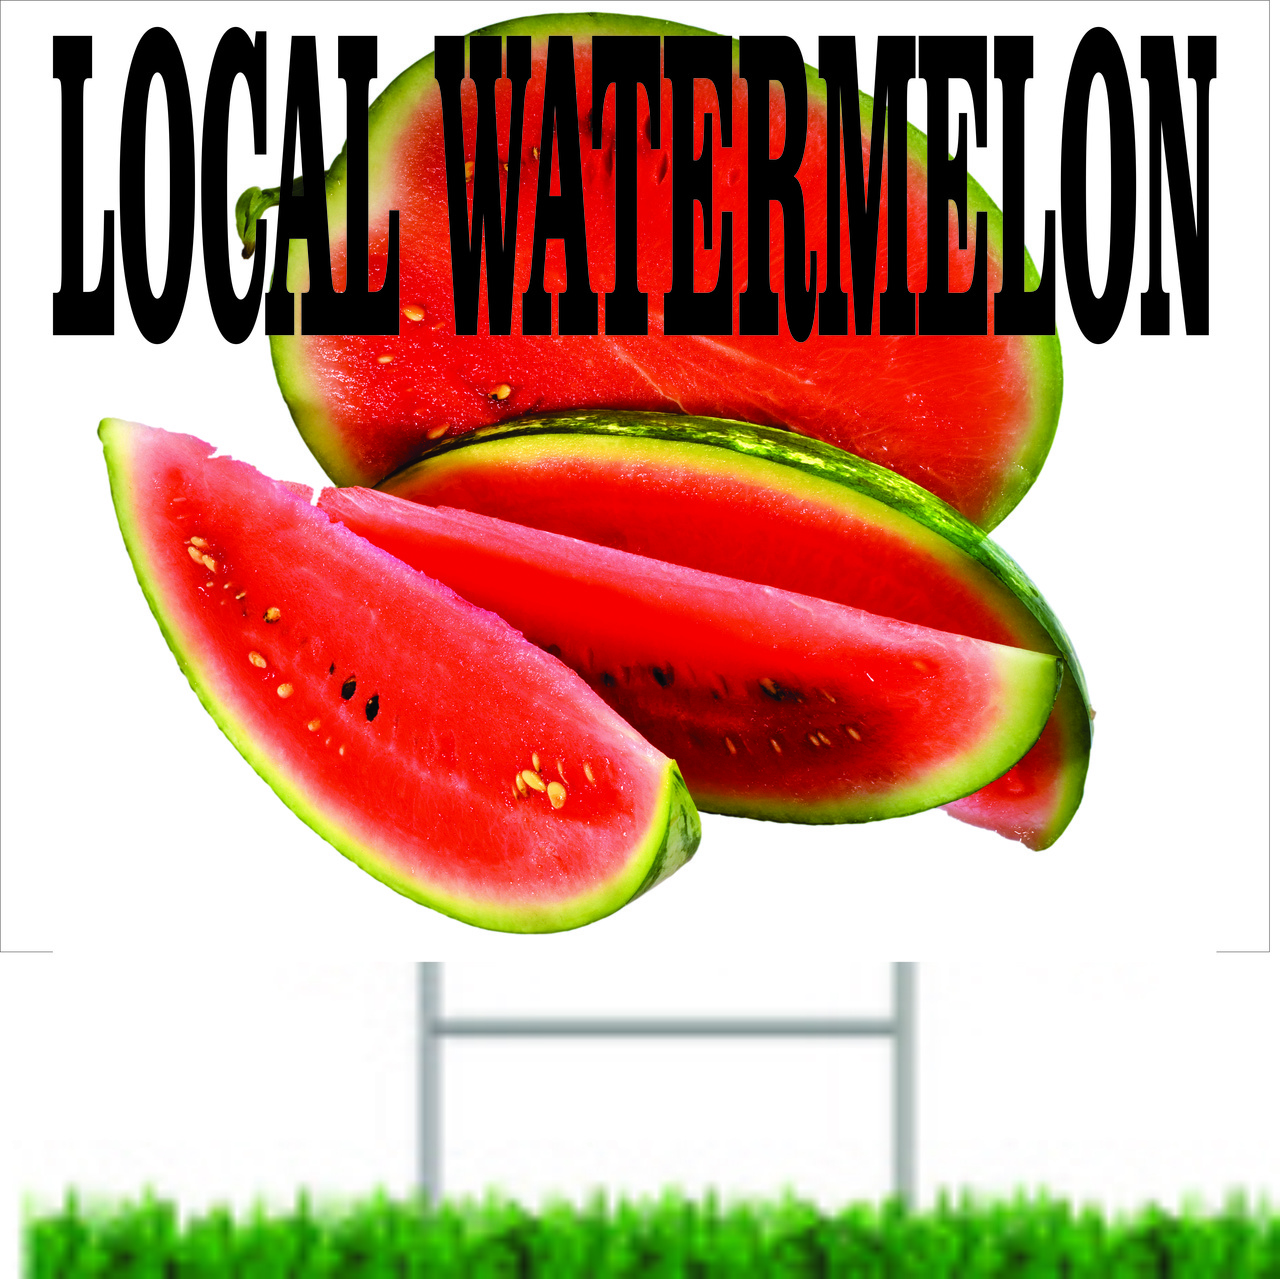 Local Watermelon Road Sign.